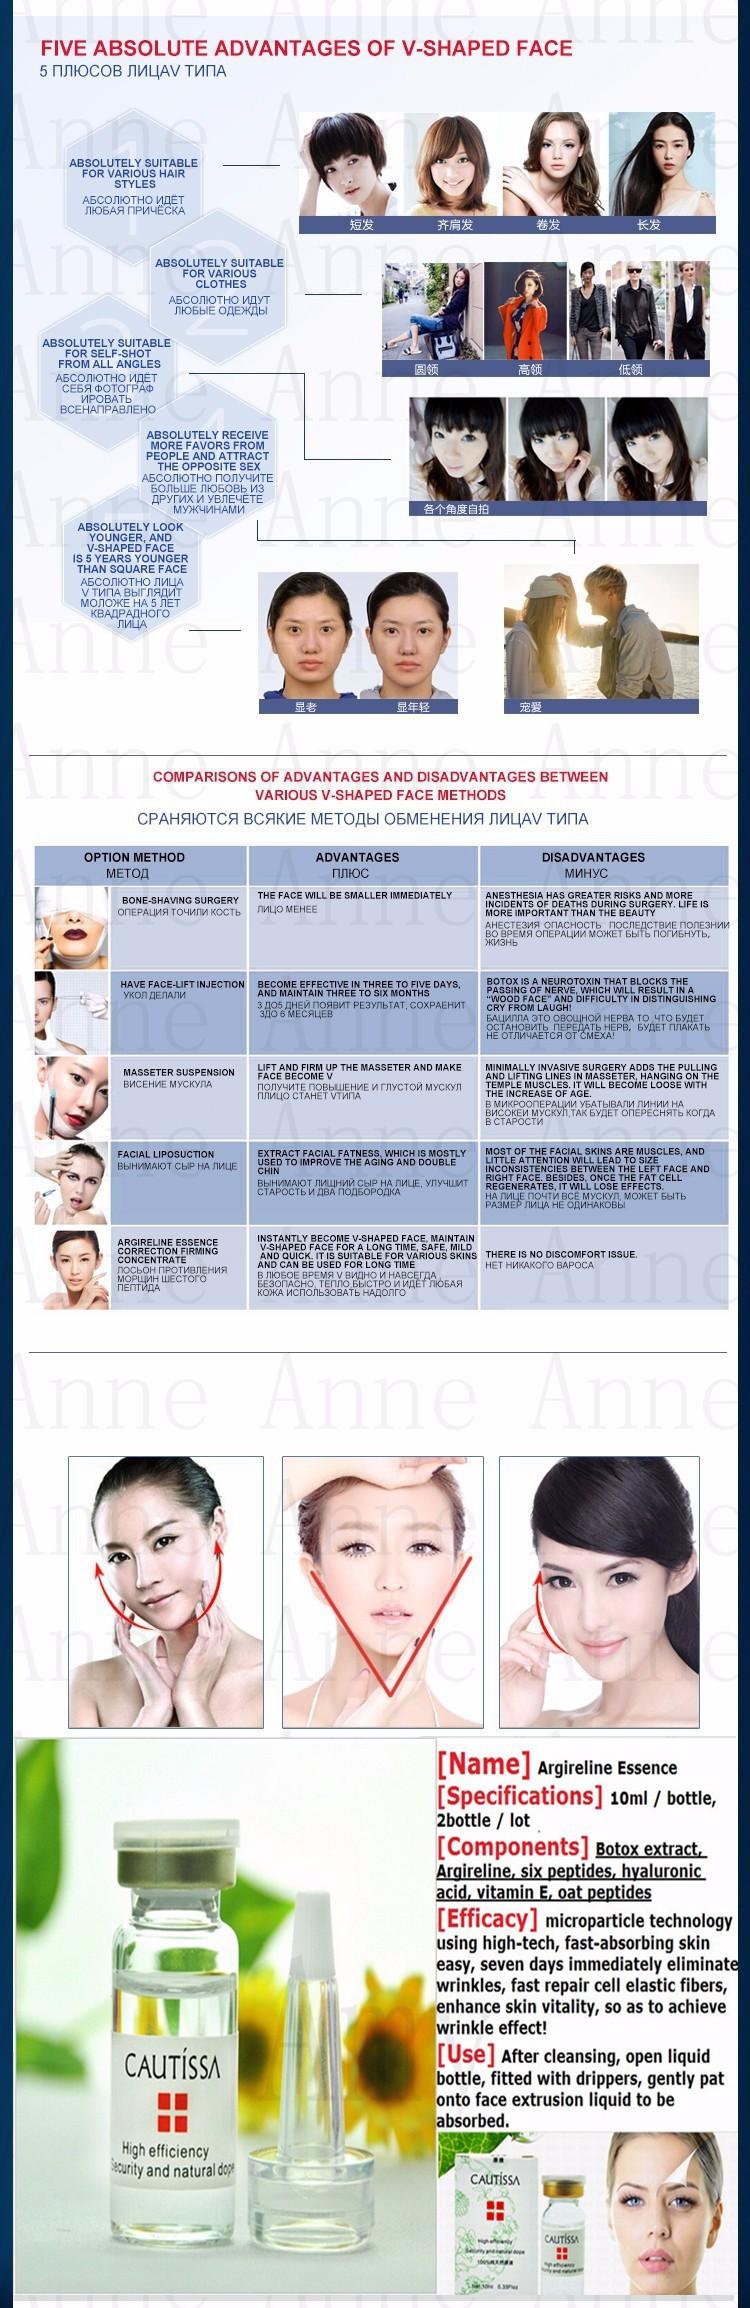 US $9 9 45% OFF|3 pcs Argireline Liquid Anti Wrinkle Anti Aging Face Lift  Serum 10ml Hyaluronic Acid Liquid Ageless Cream Facial Lifting Firming-in